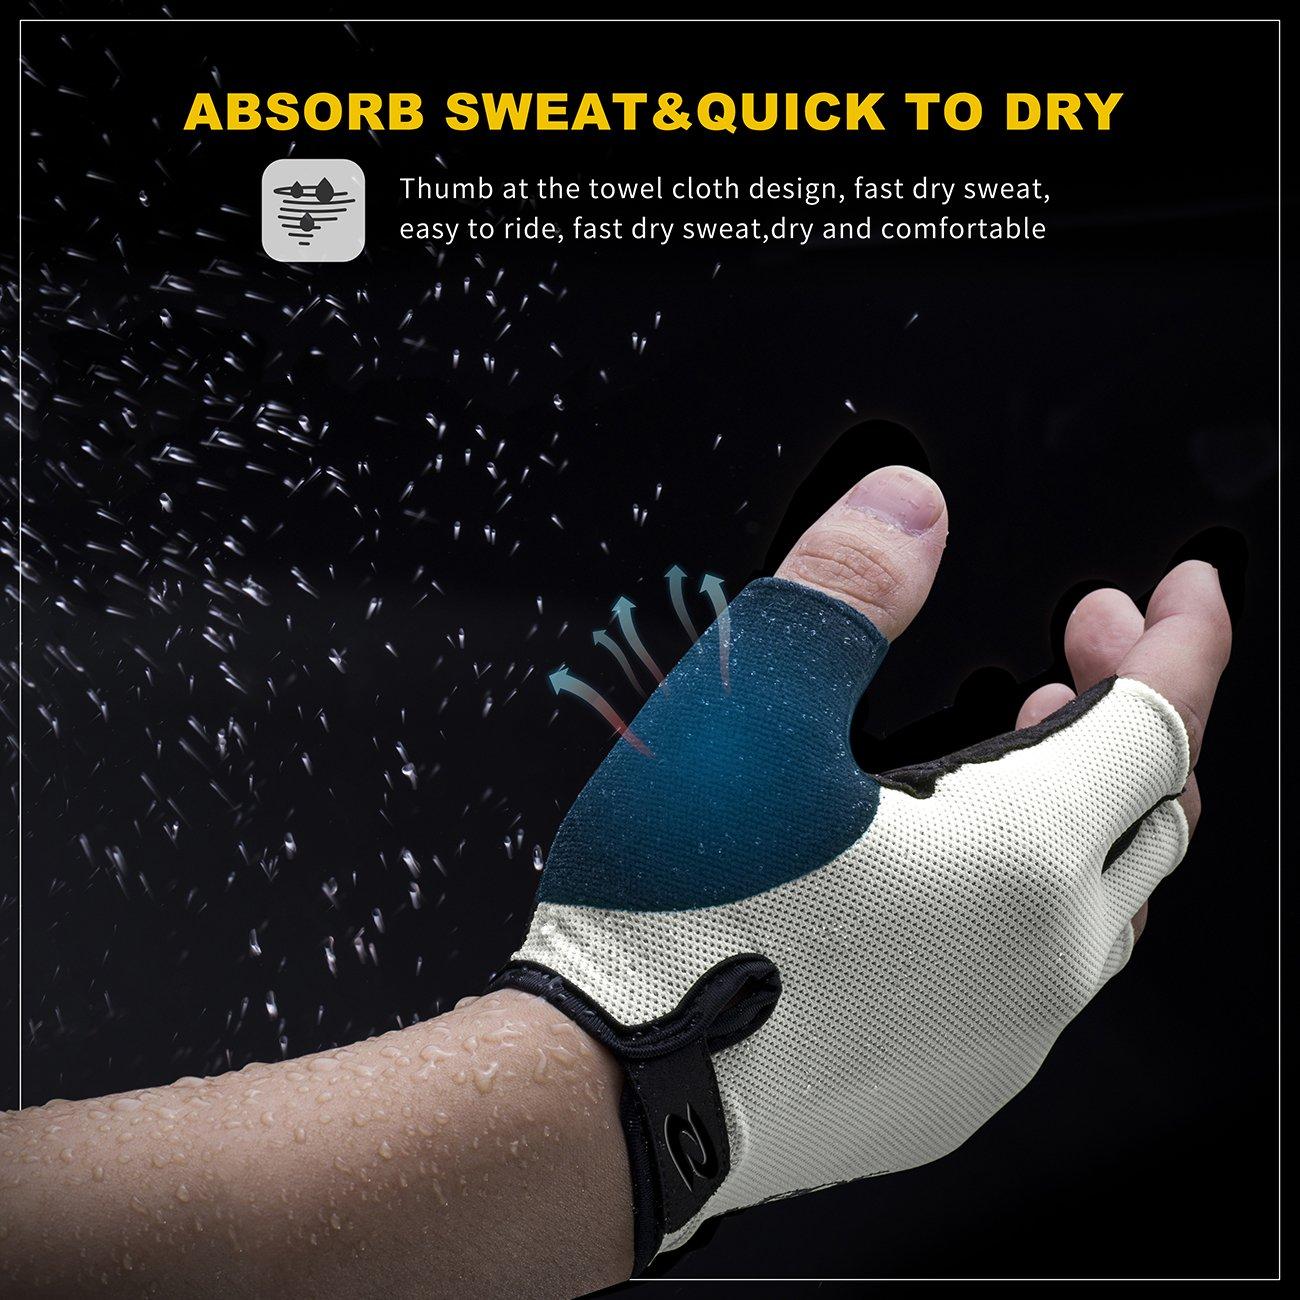 RIVBOS Bike Gloves Cycling Gloves Fingerless for Men Women with Foam Padding Breathable Mesh Fashion Design CHG001